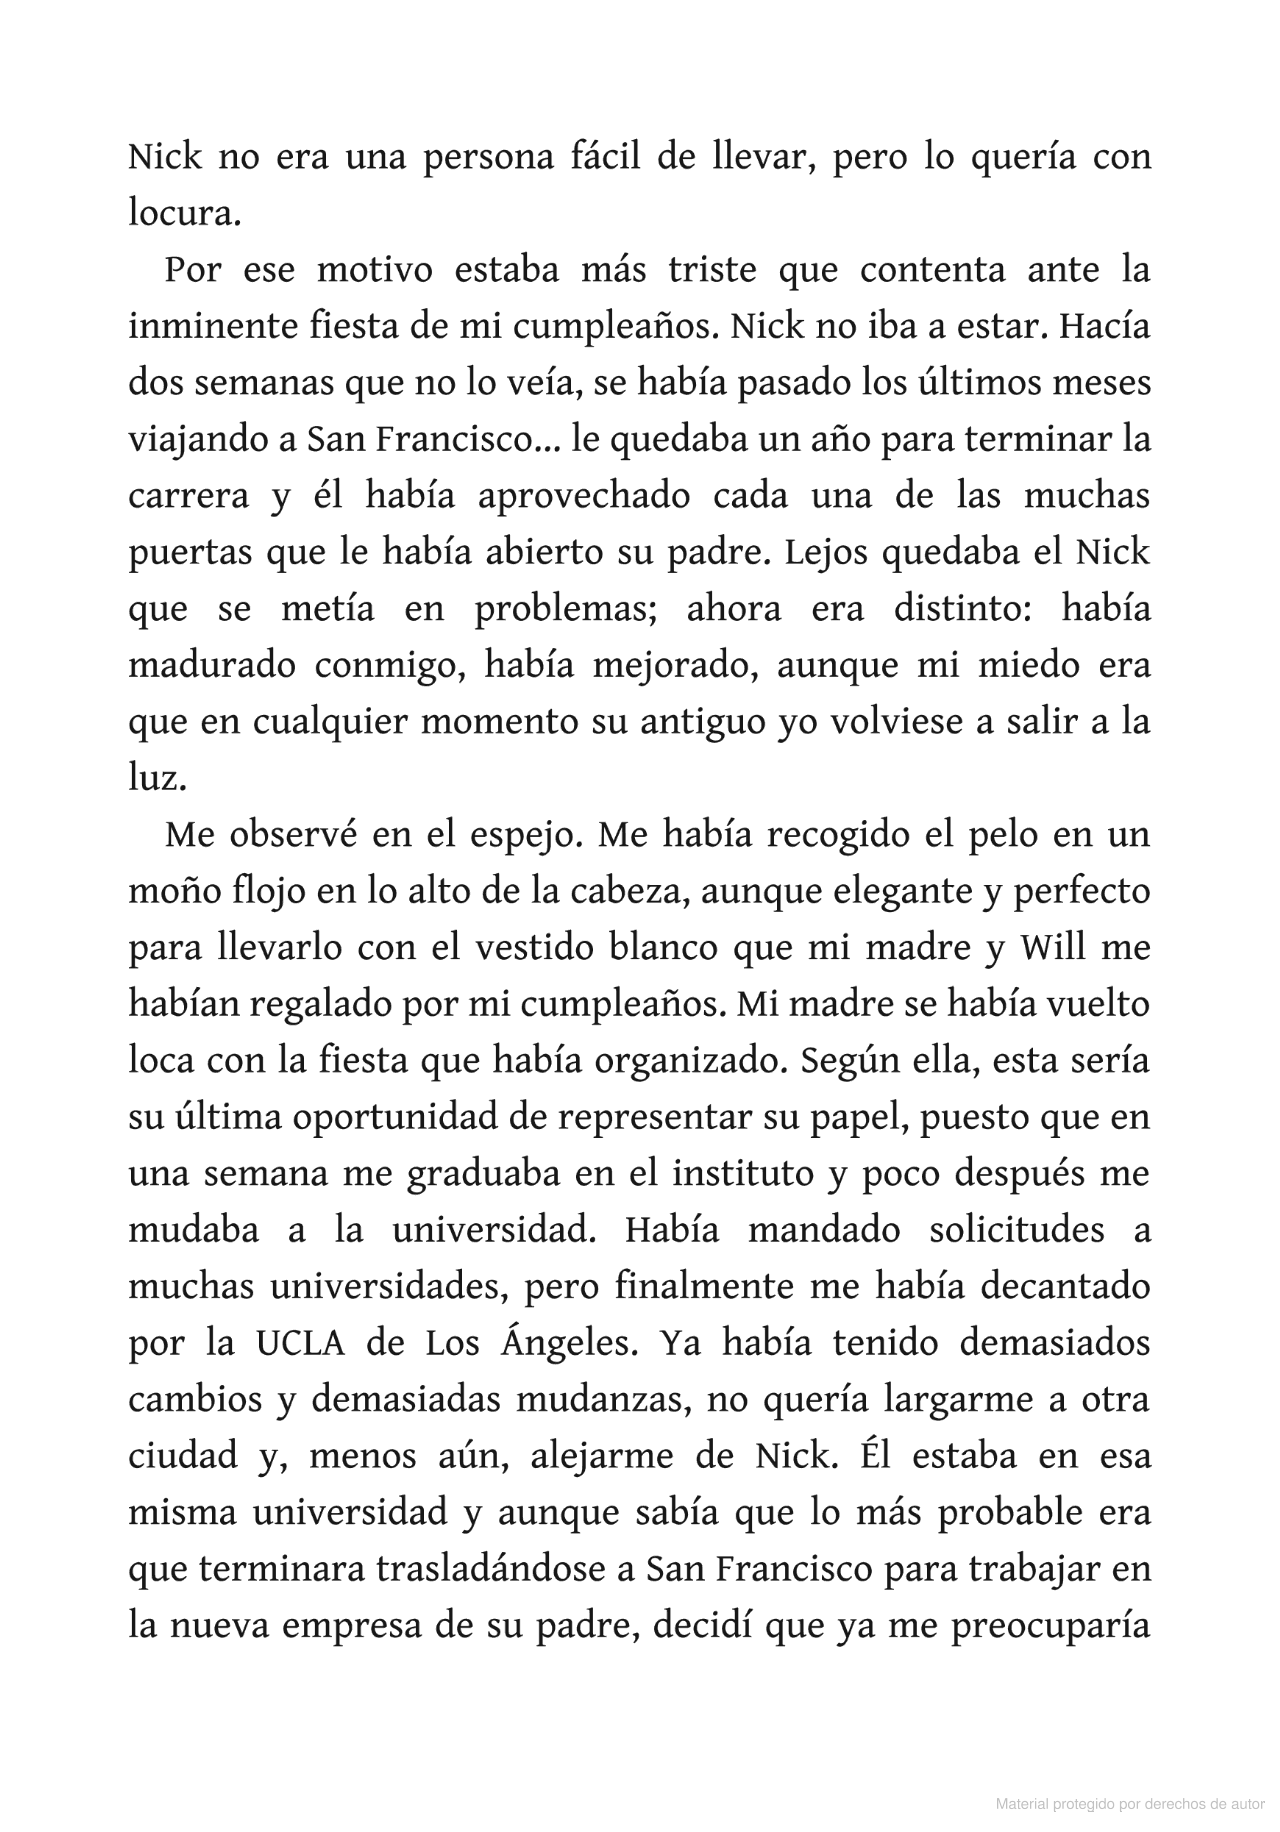 Culpa Tuya Culpables 2 Mercedes Ron Google Libros En 2020 Culpables Culpa Libros